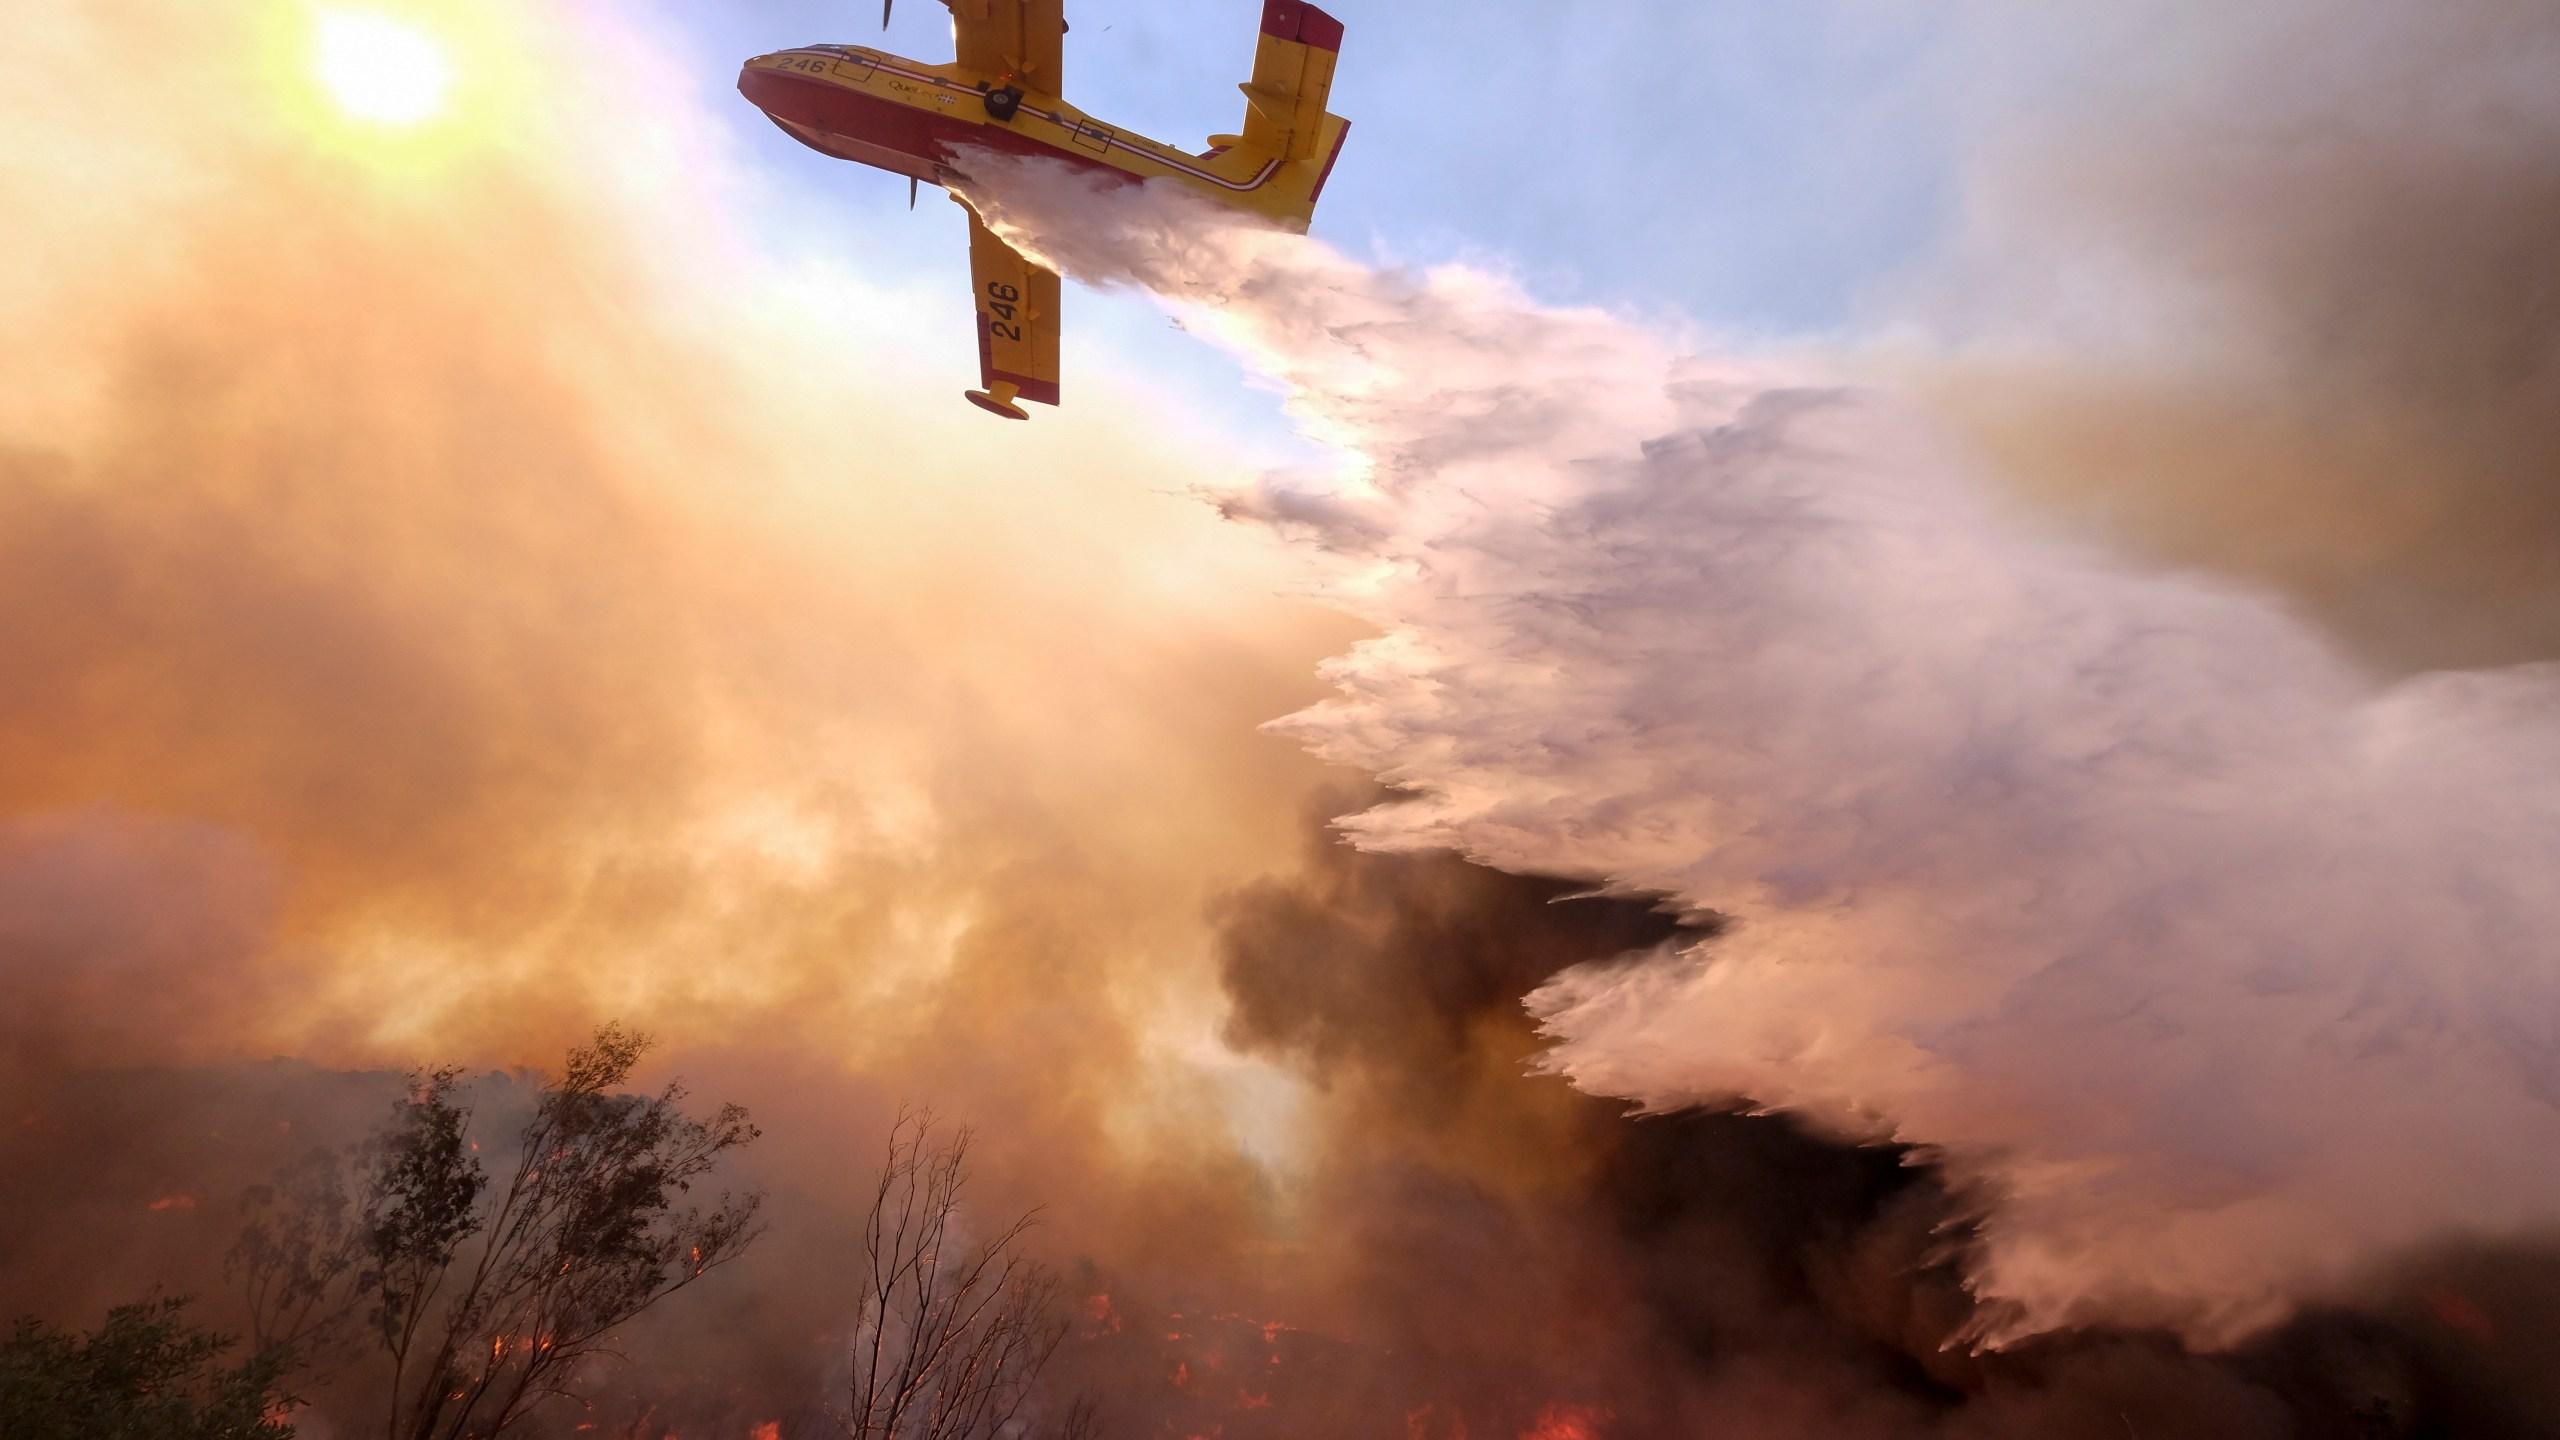 APTOPIX_California_Wildfires_68122-159532.jpg79963124